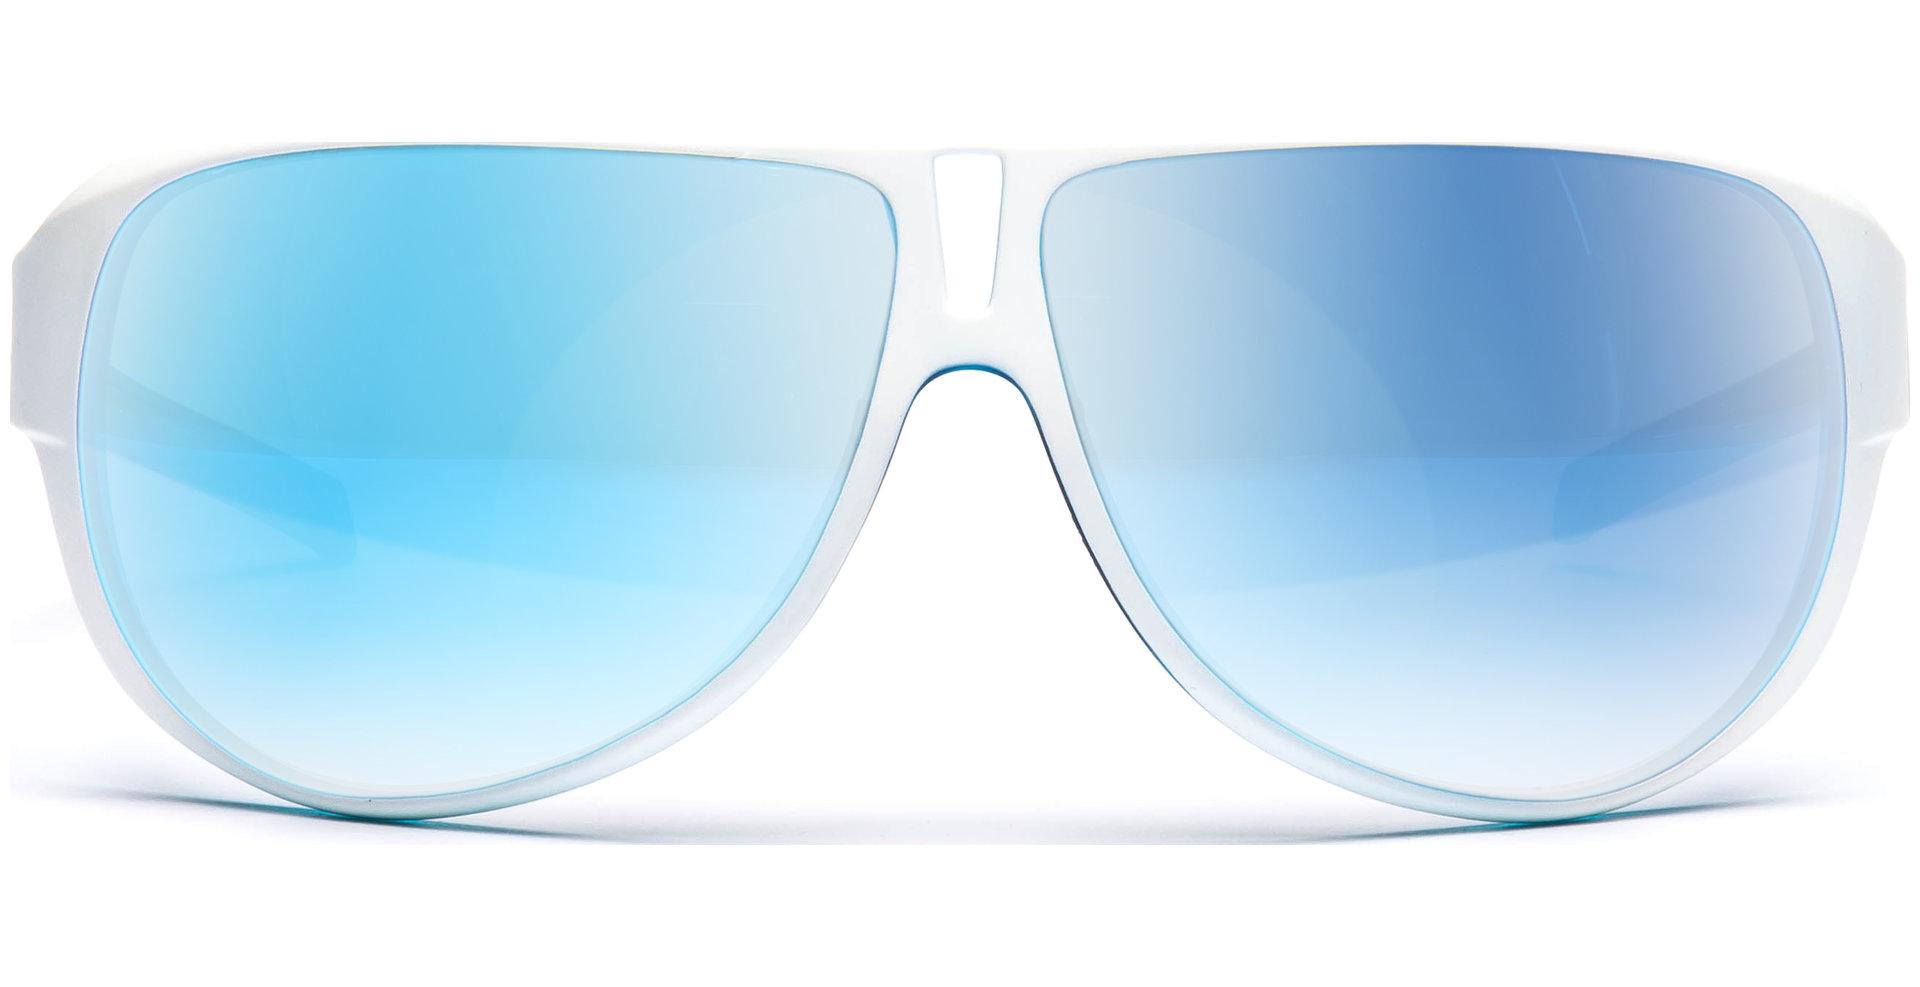 red bull racing eyewear esto esto 007s 6609 wei blau. Black Bedroom Furniture Sets. Home Design Ideas